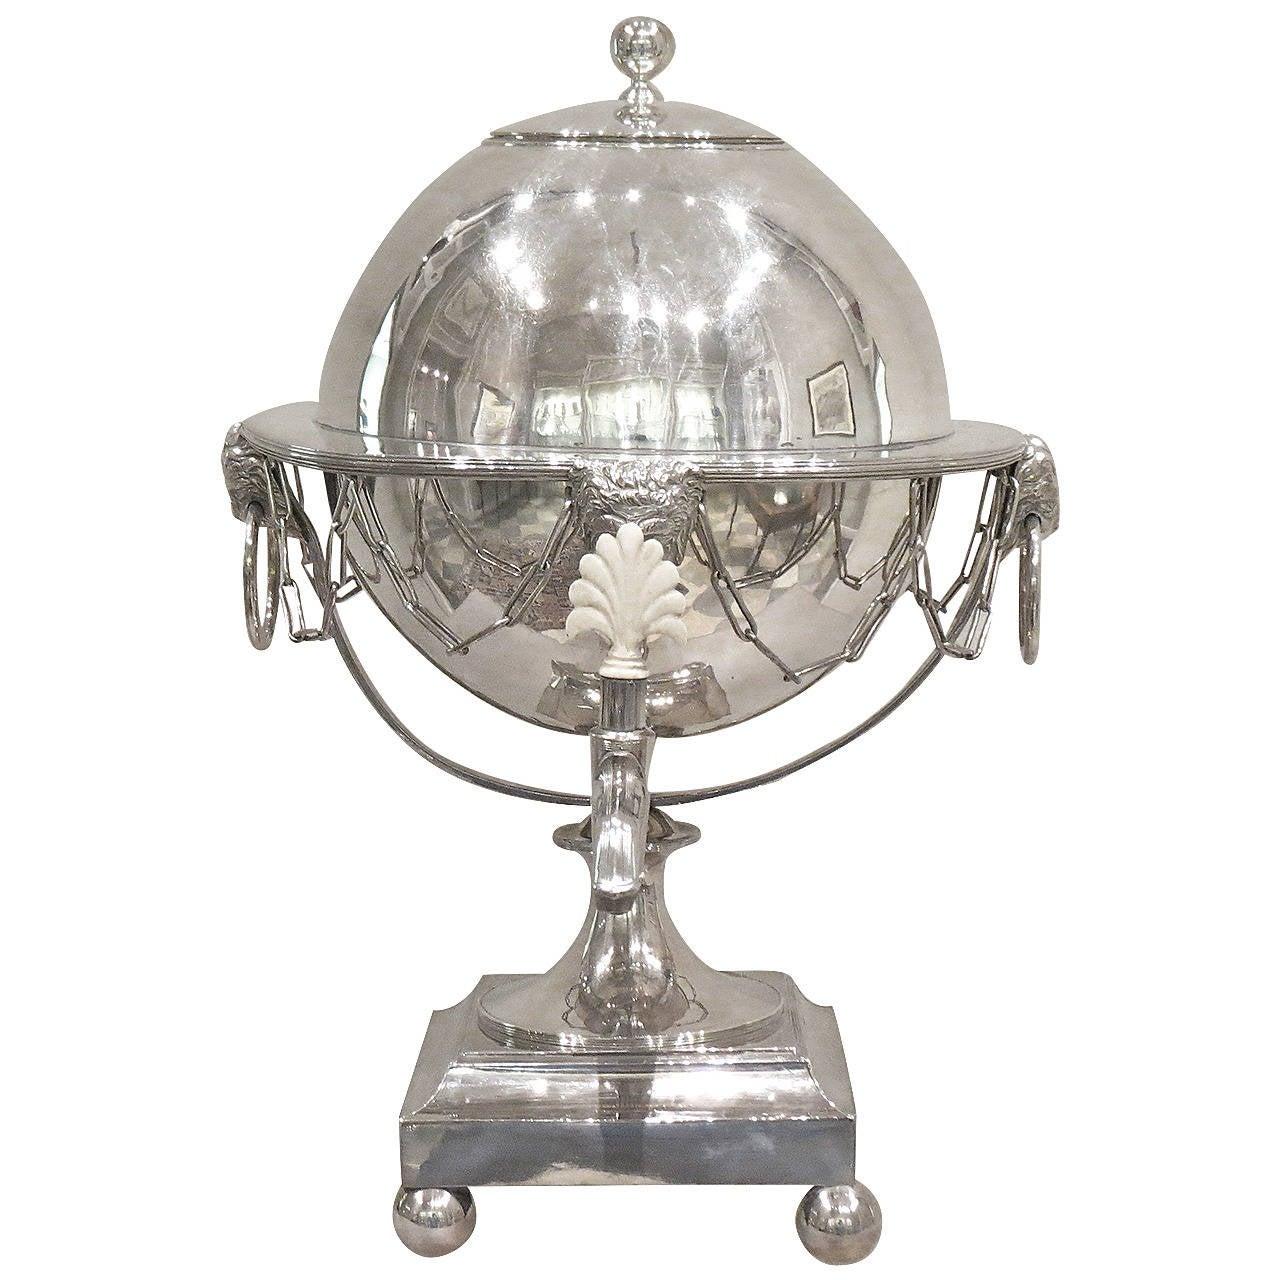 Neoclassical Sheffield Plate Atlas Tea Urn